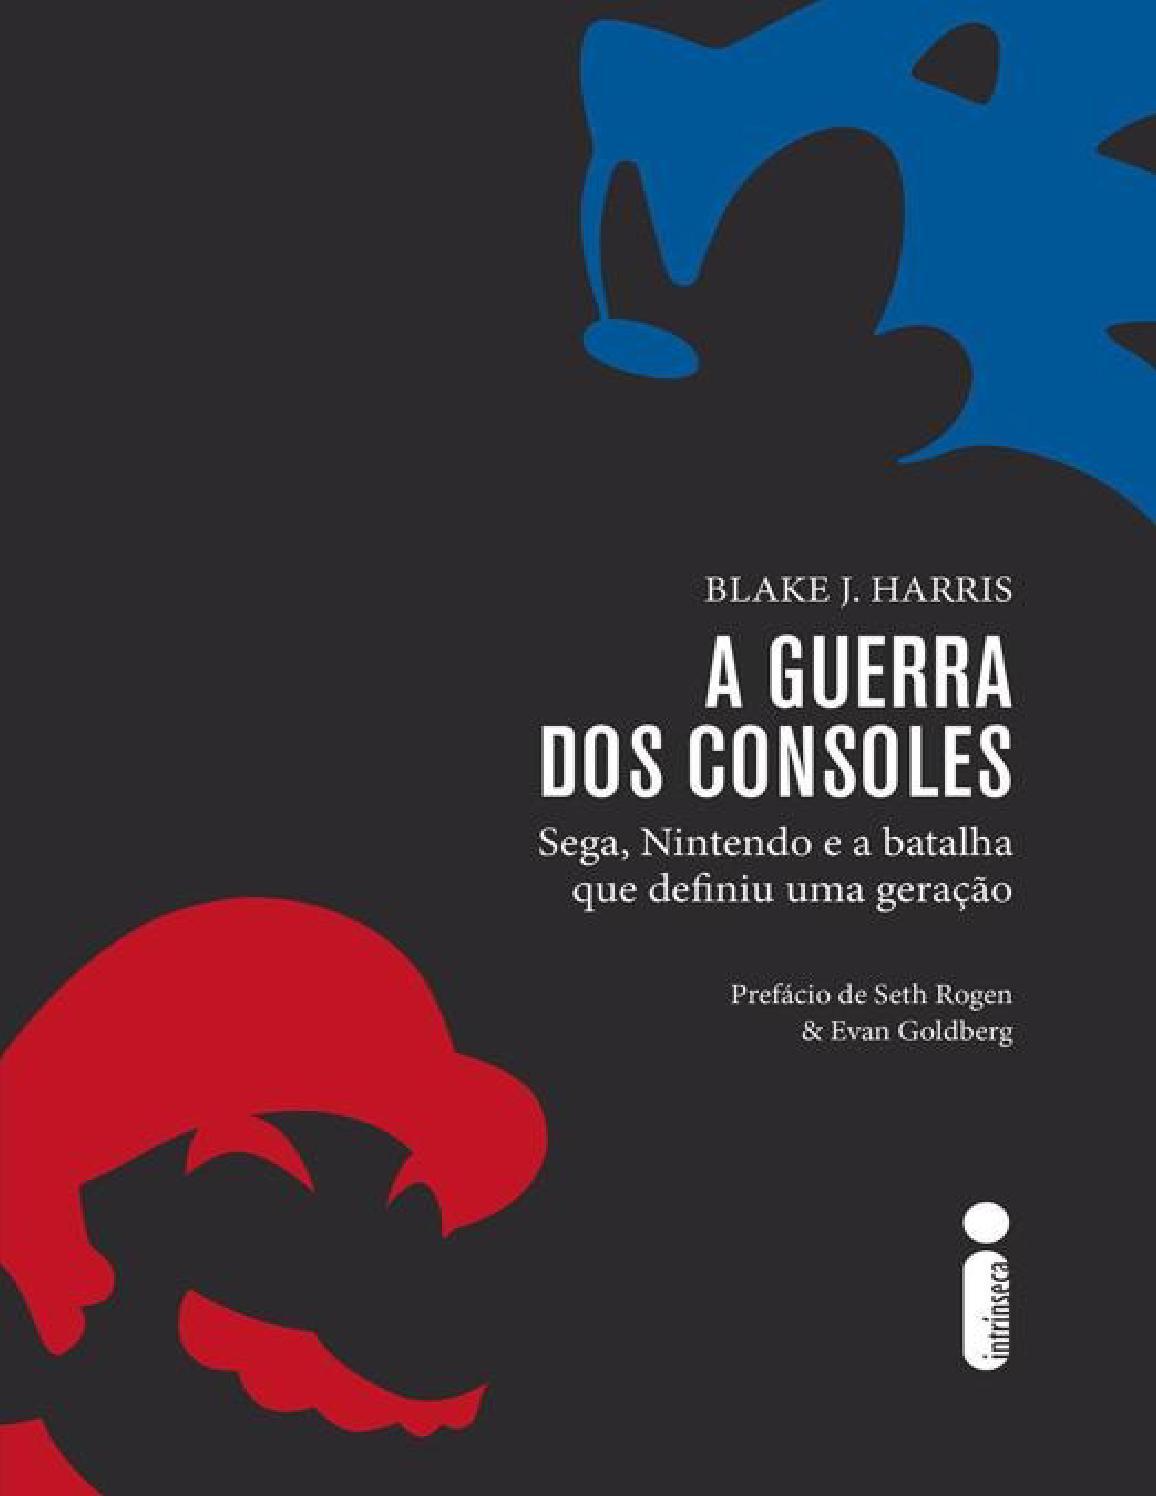 d8761b5610 A guerra dos consoles by John Wick - issuu